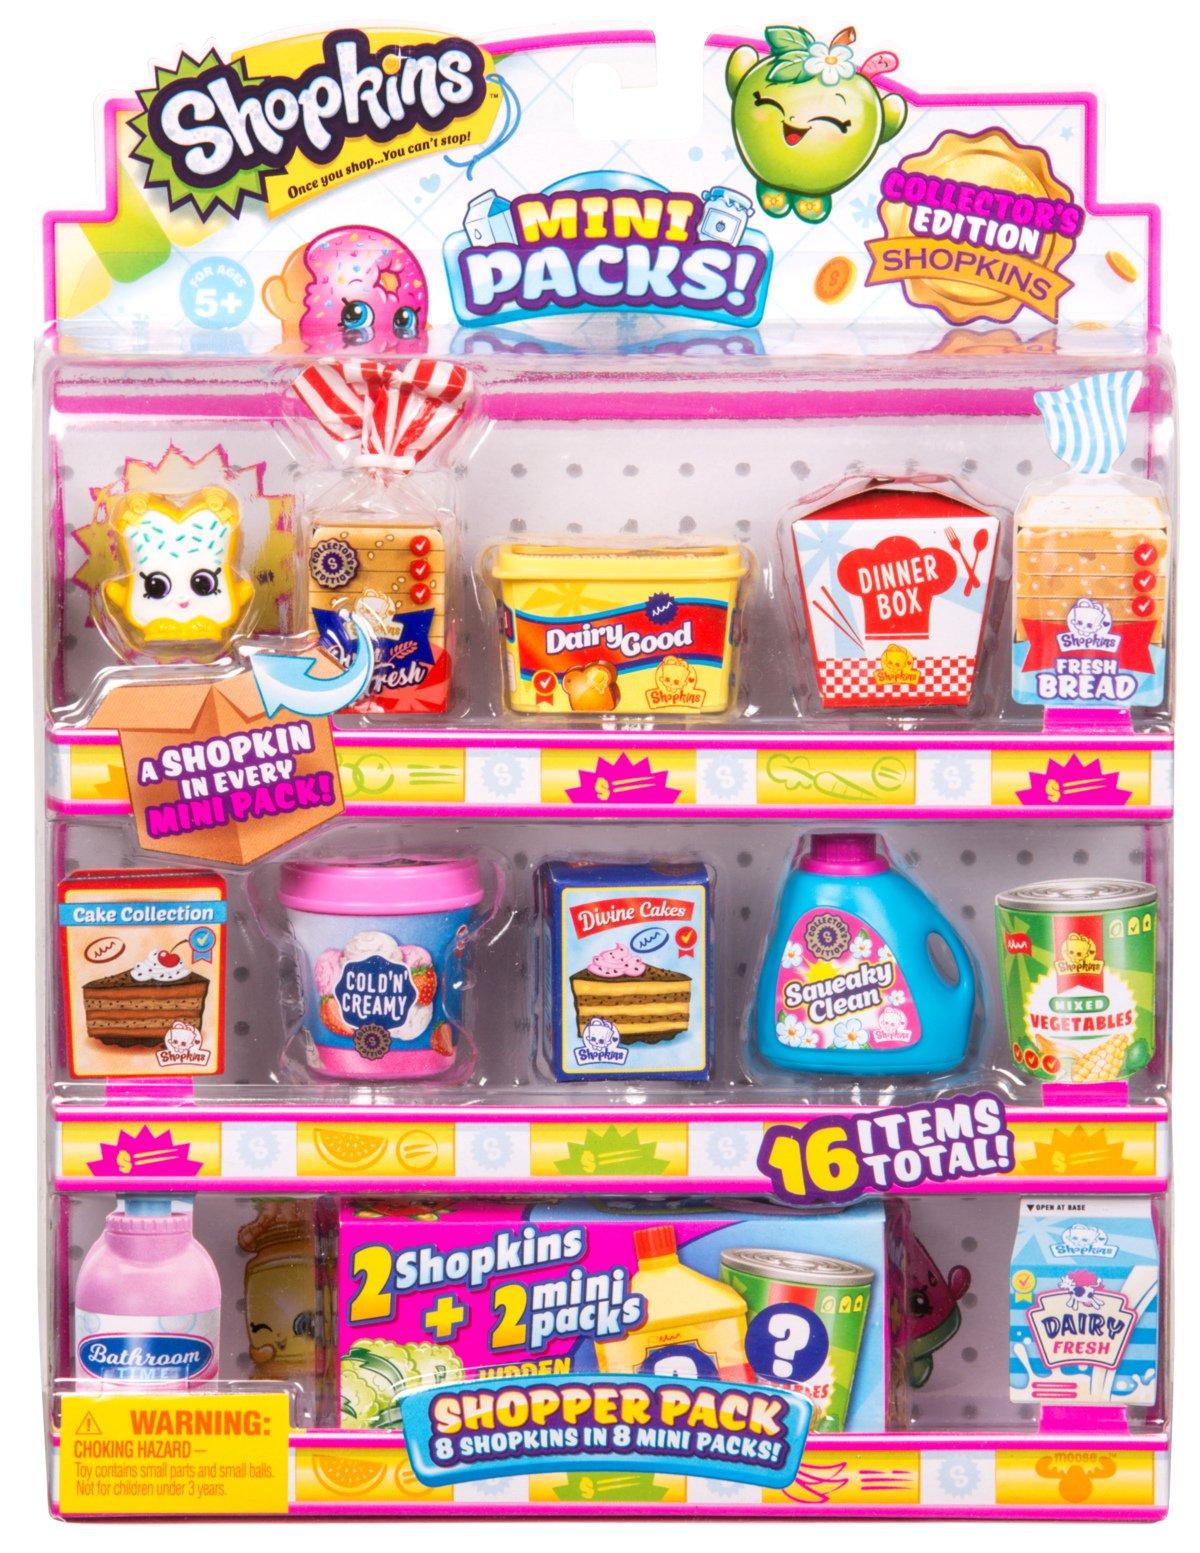 Shopkins Season 10 Mini Pack - Shopper Pack by Shopkins